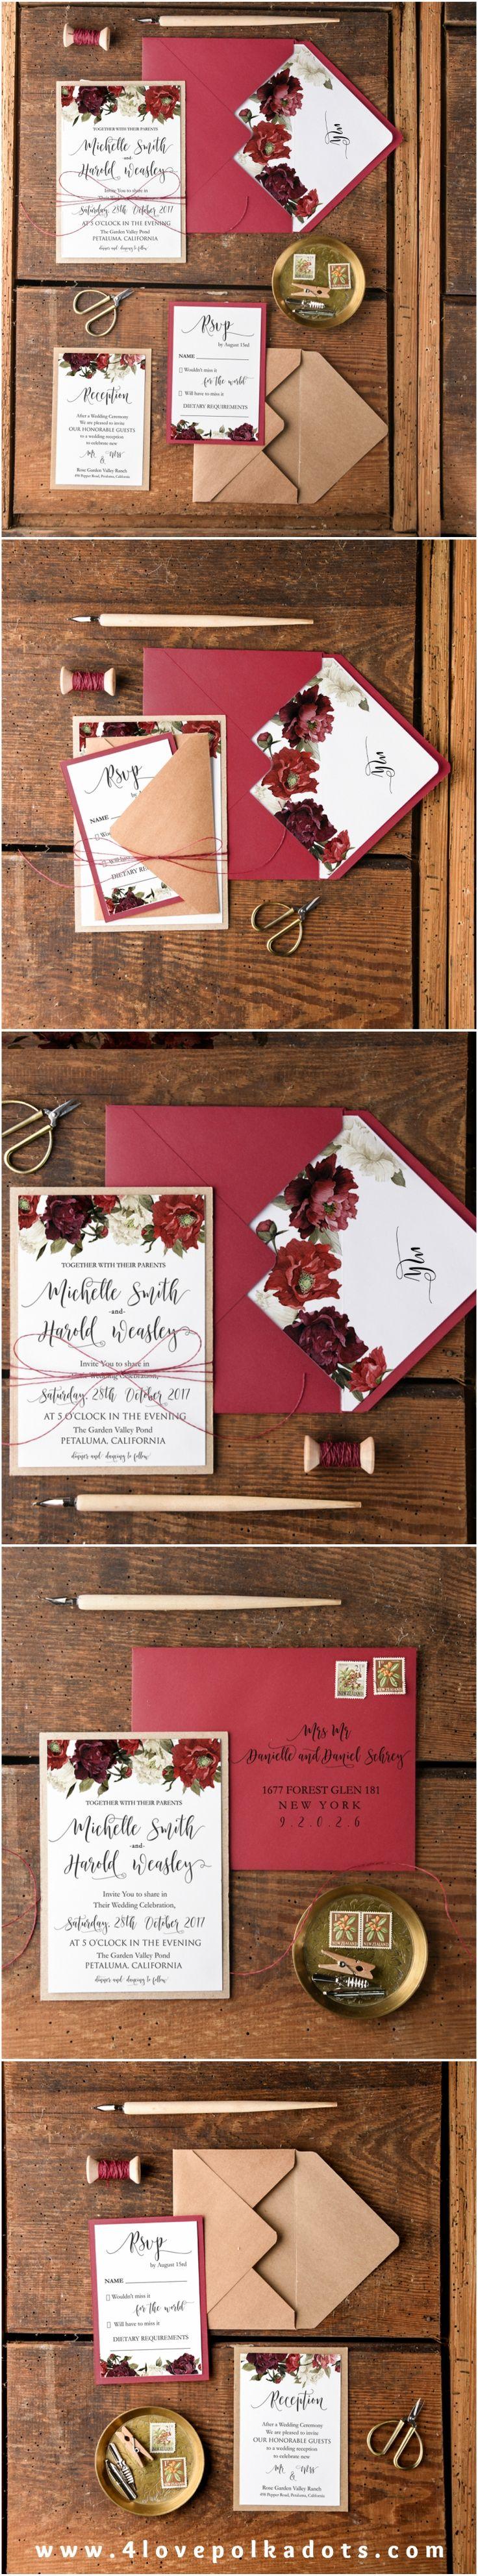 print yourself wedding invitations kit%0A Floral Wedding Invitation